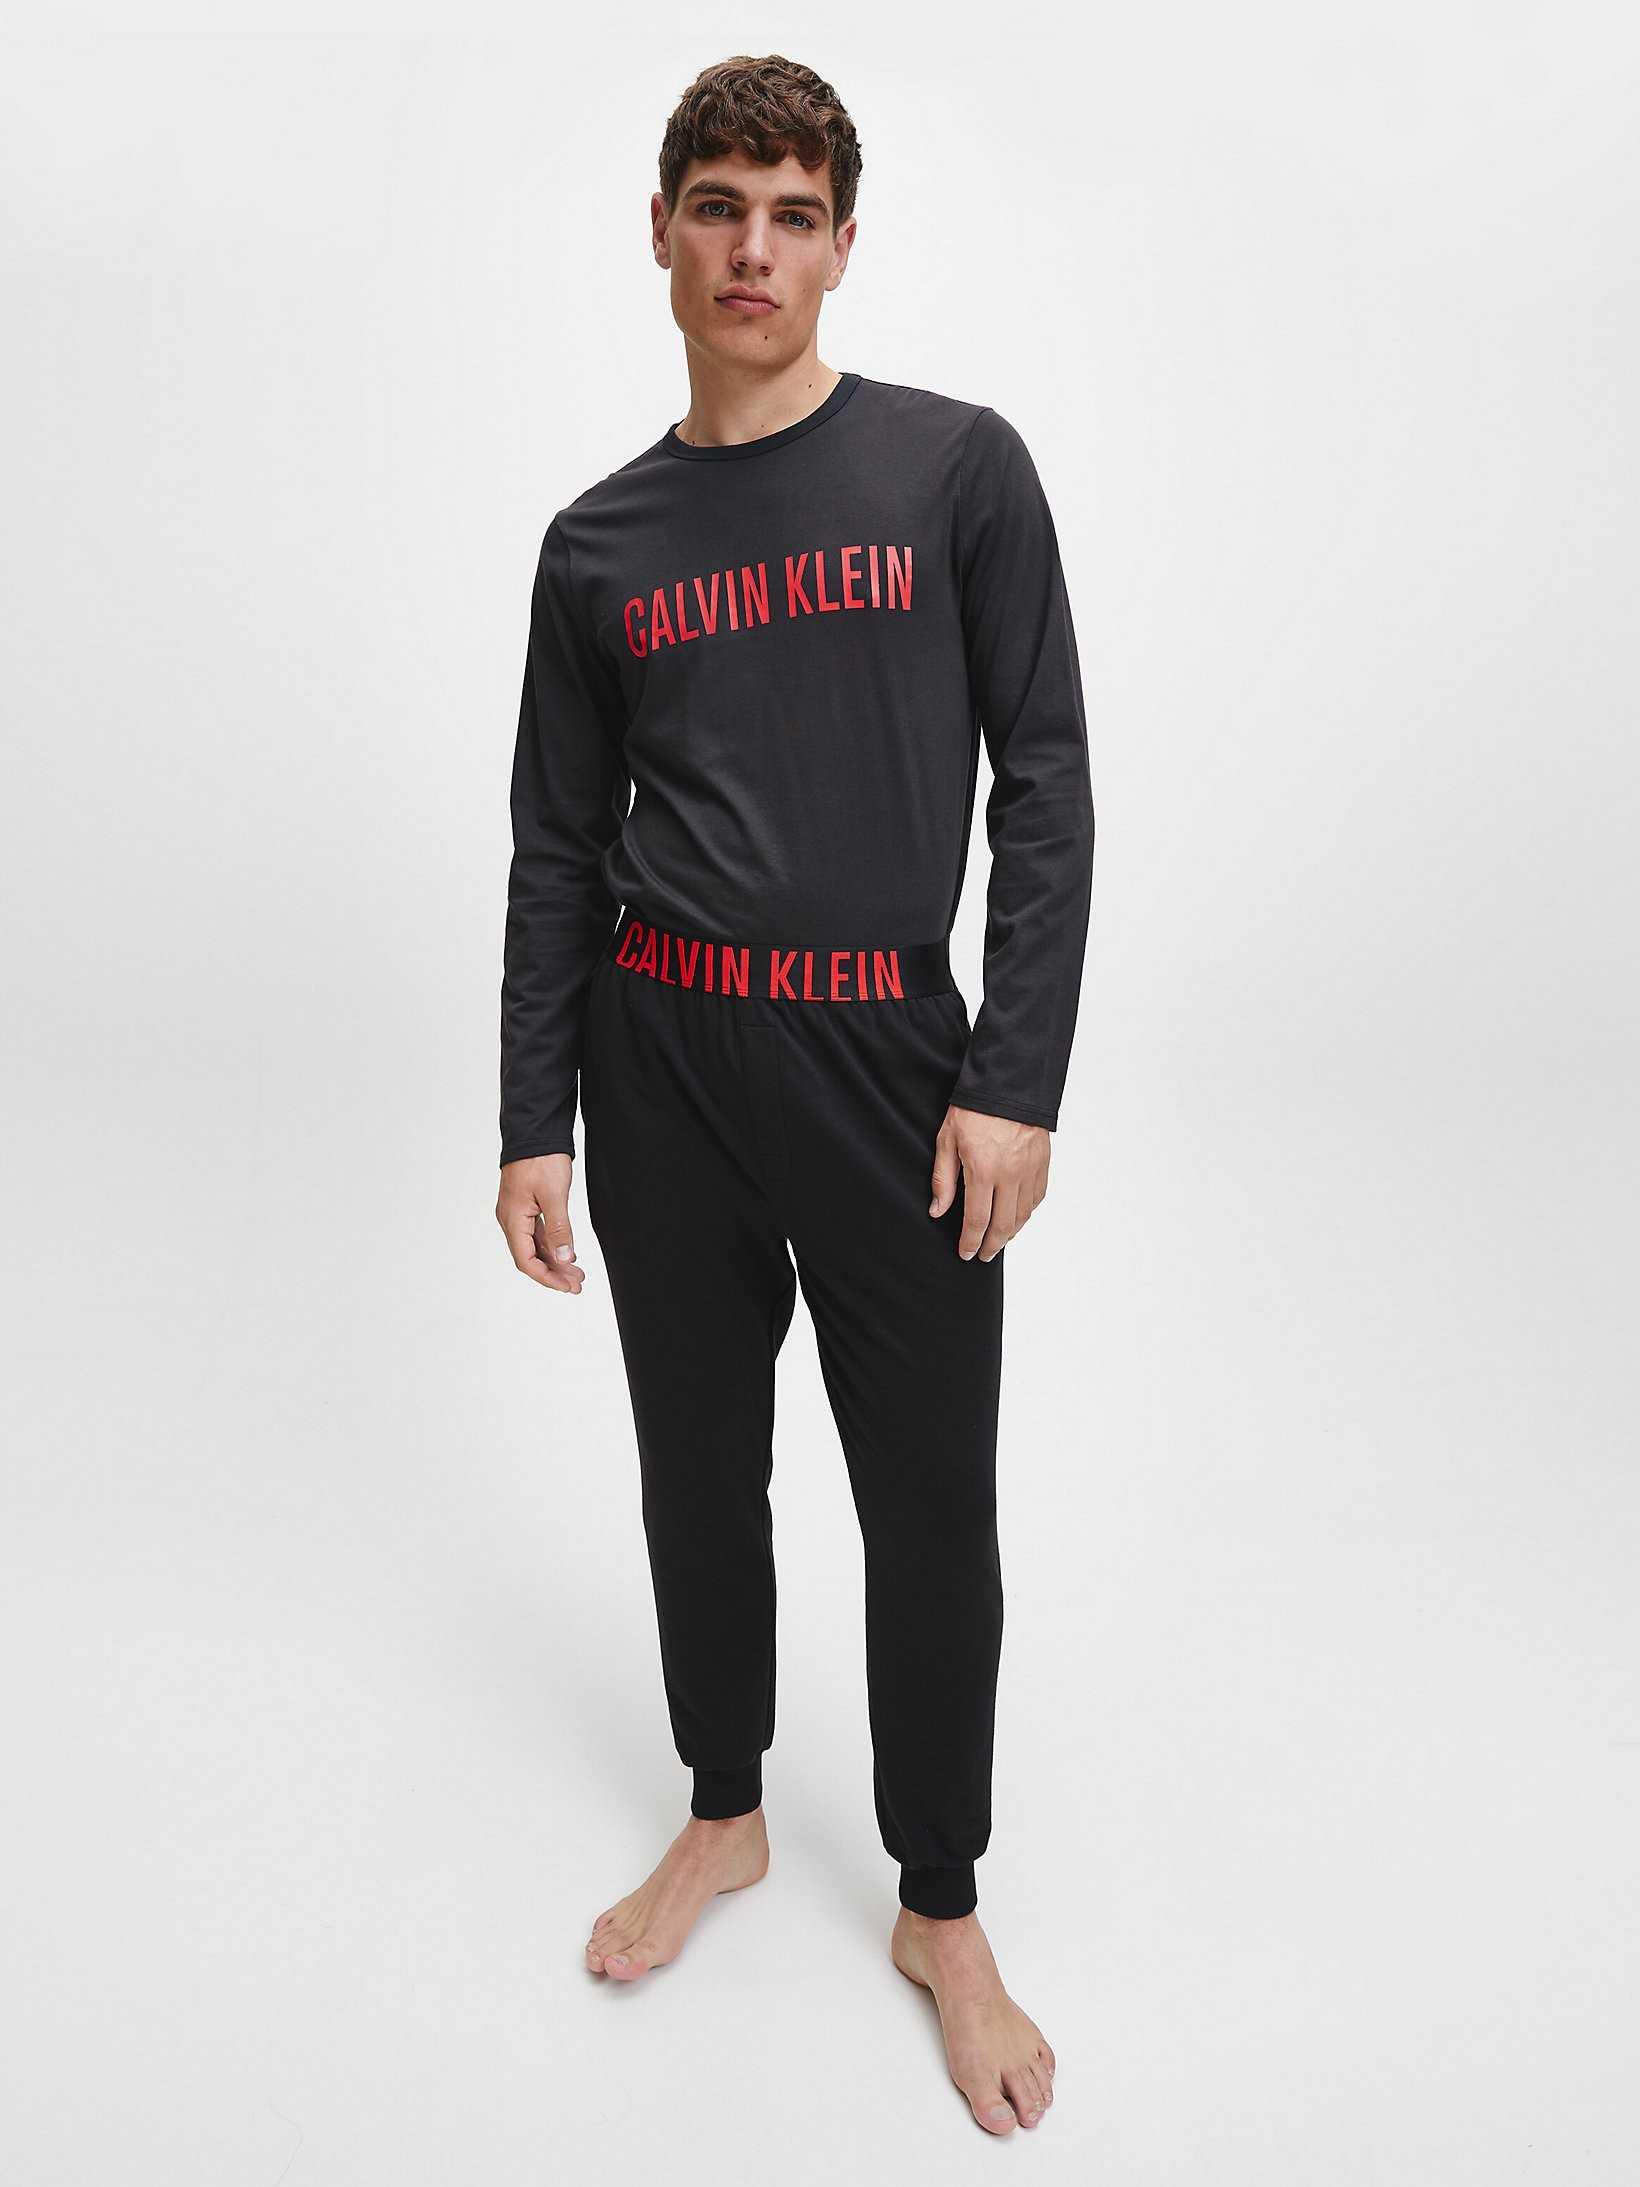 Camiseta Caballero Calvin Klein